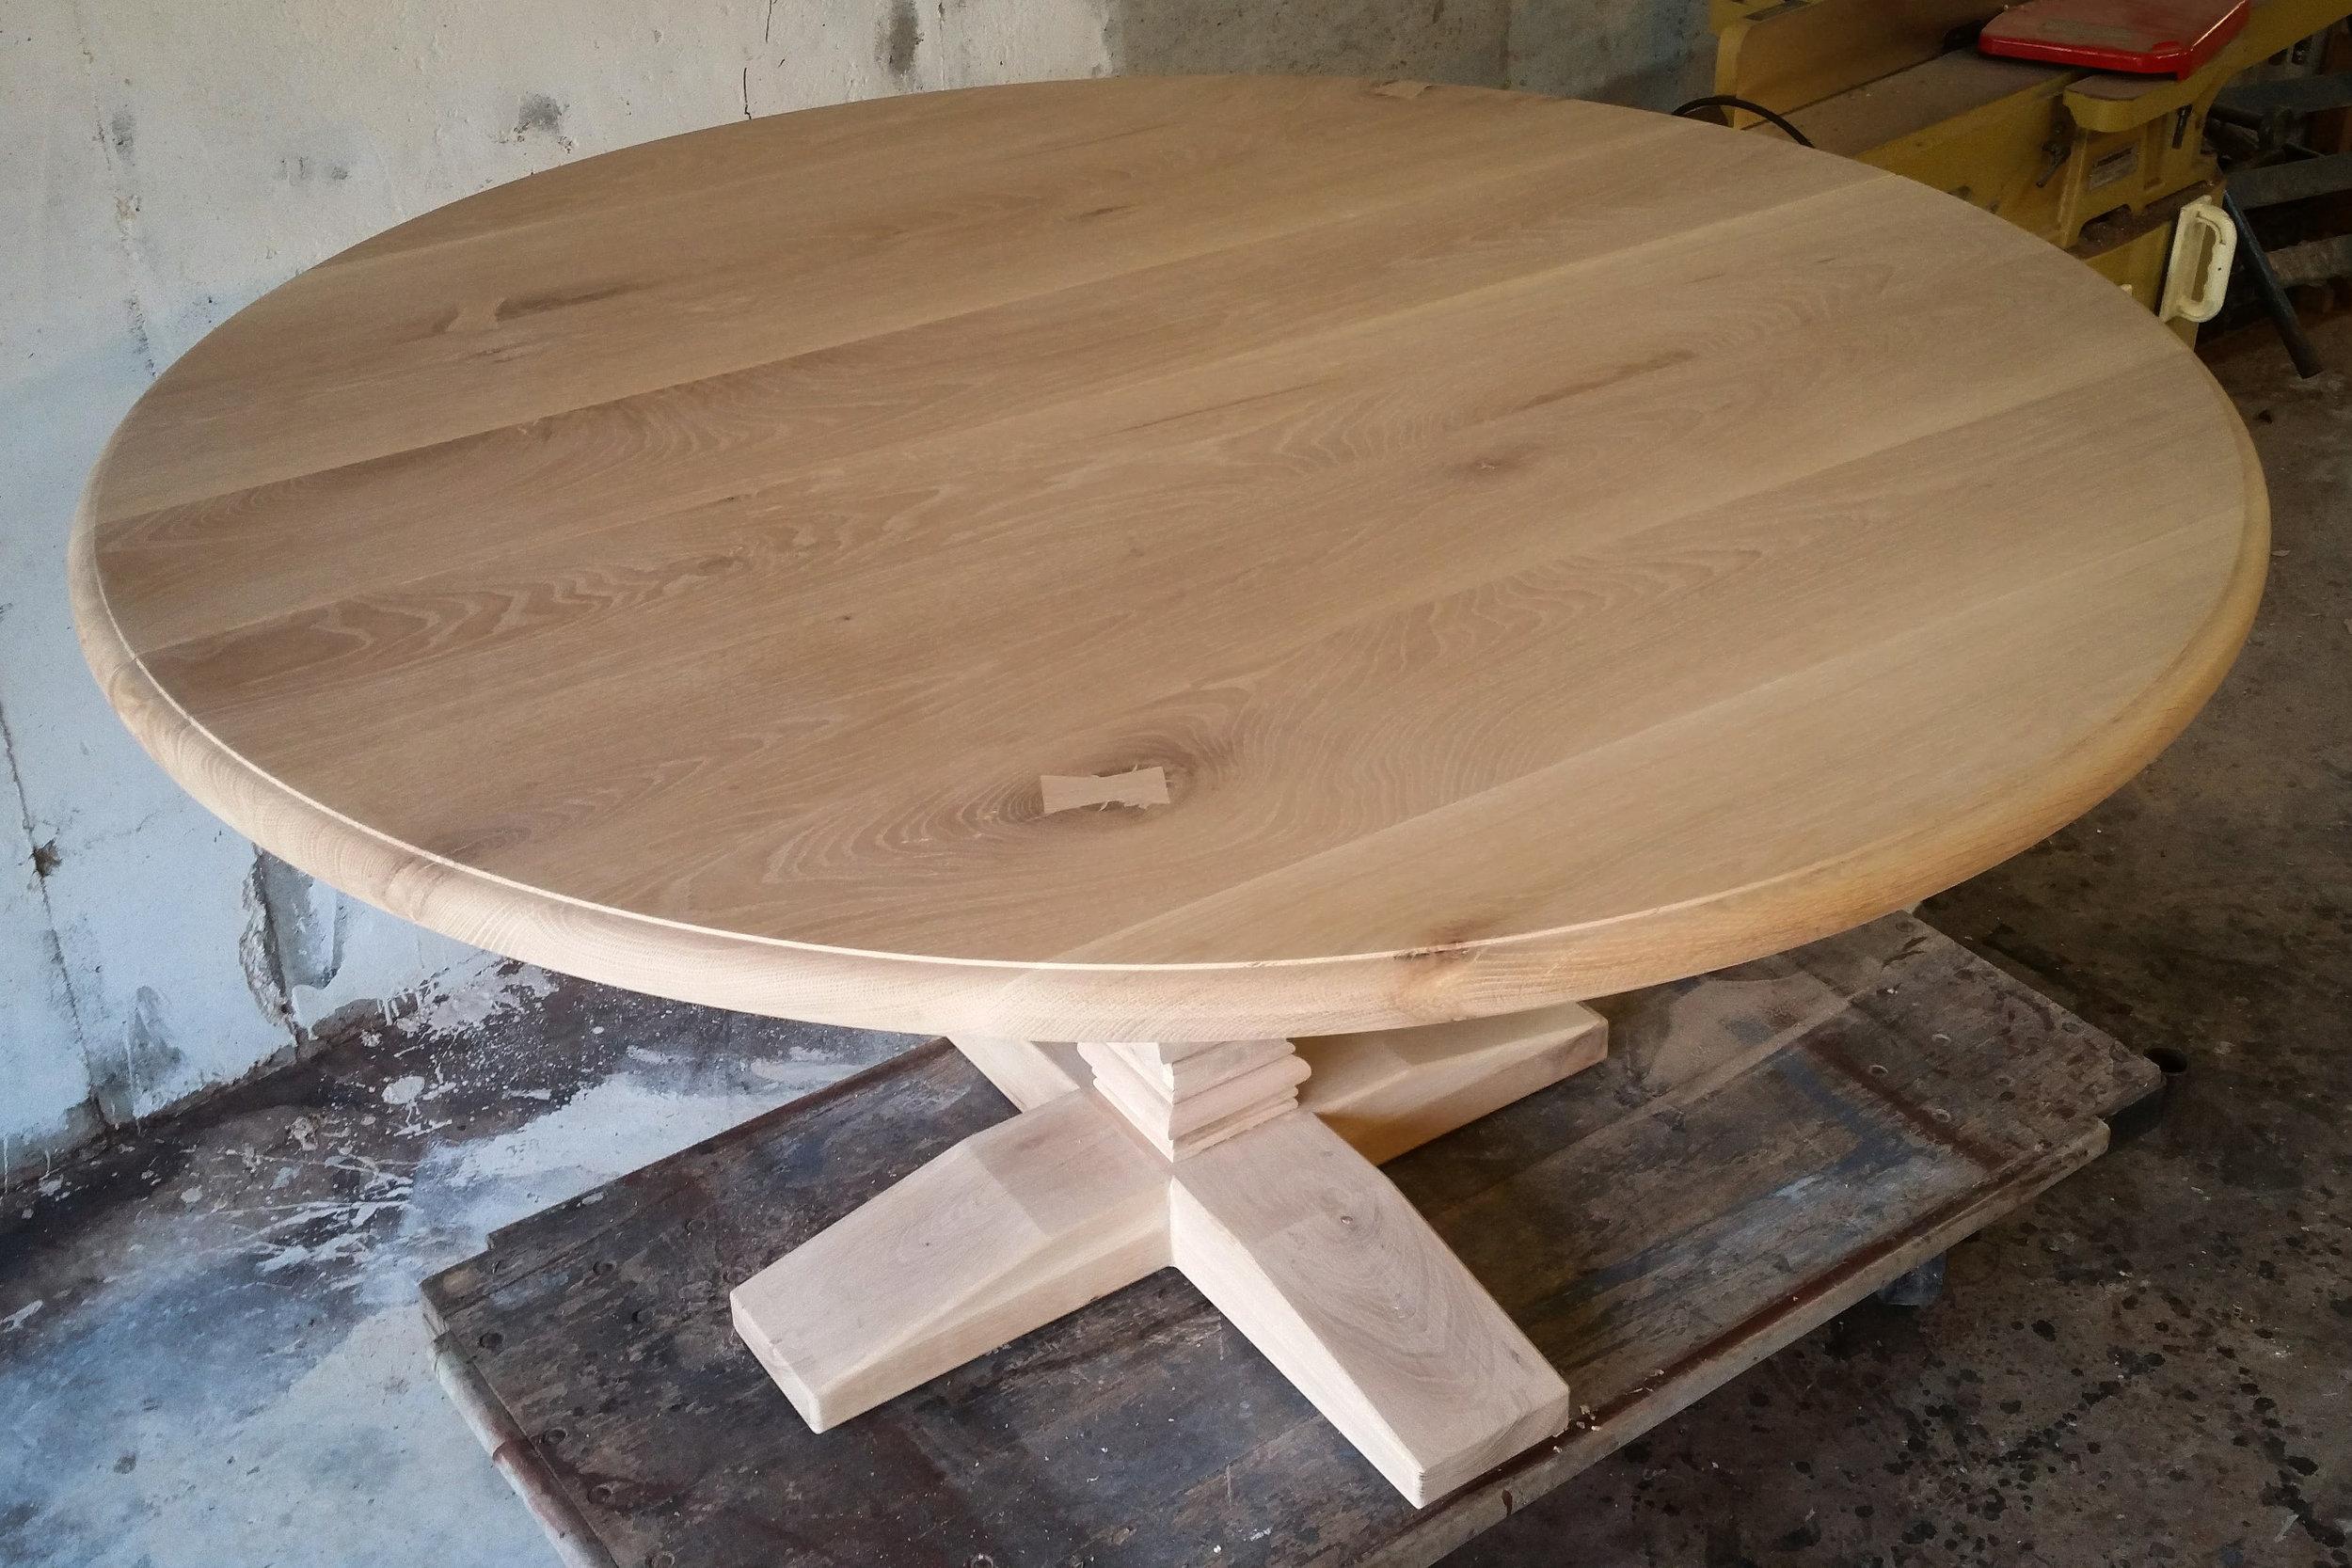 TraditionalOak-Pedestal-Table-Square-Turned-Base-1.jpg